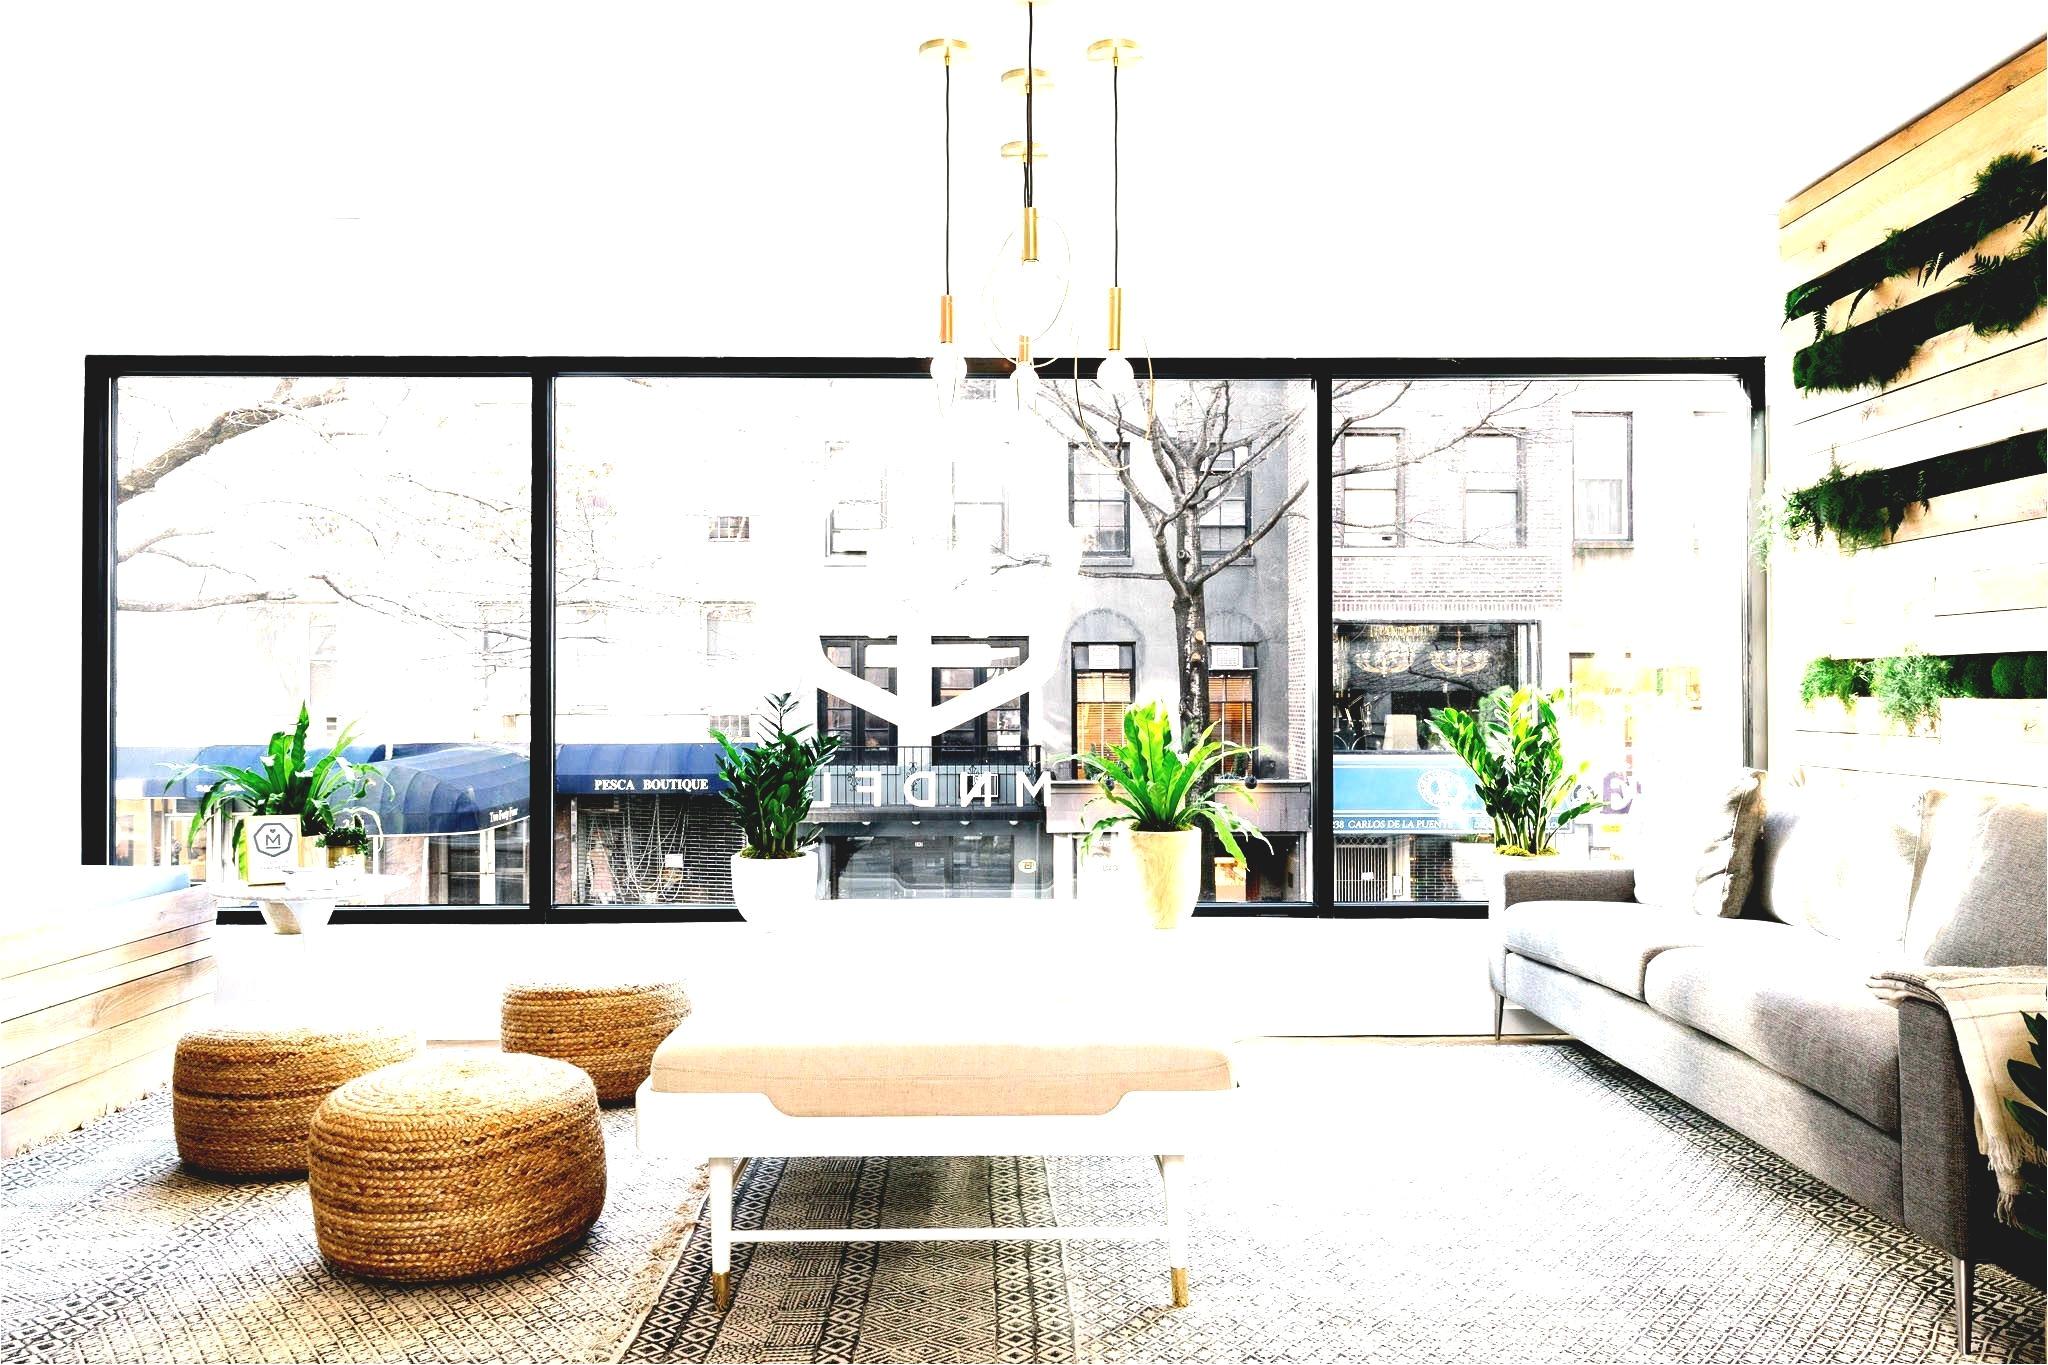 new york school of interior design gallery fresh gallery interior design new york luxury home with